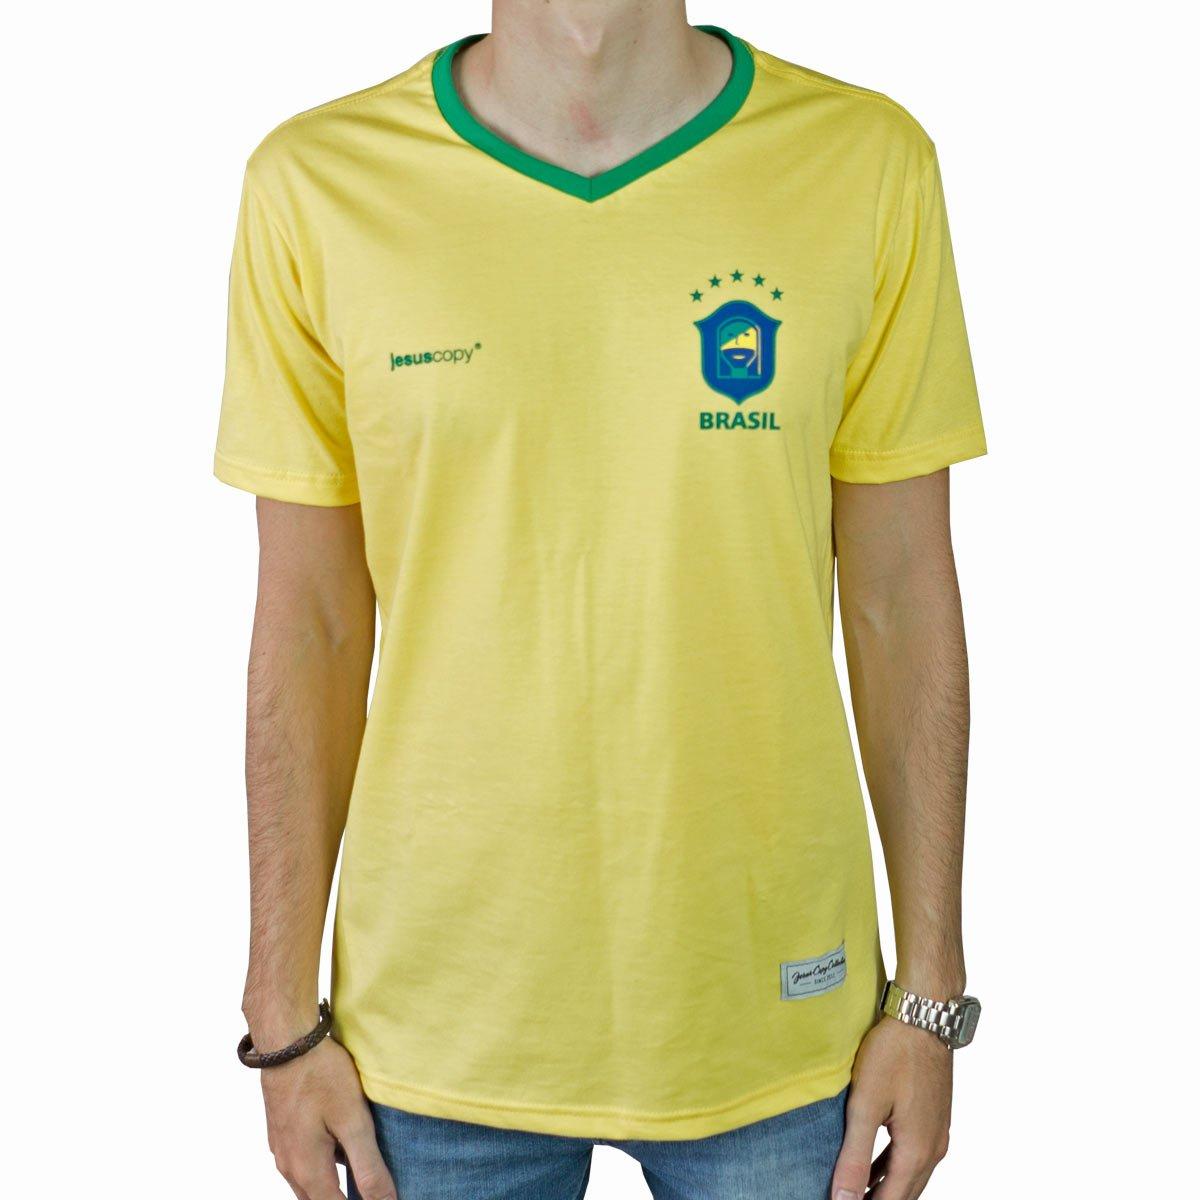 Camiseta Jesuscopy Brasil - Amarela  - Jesuscopy